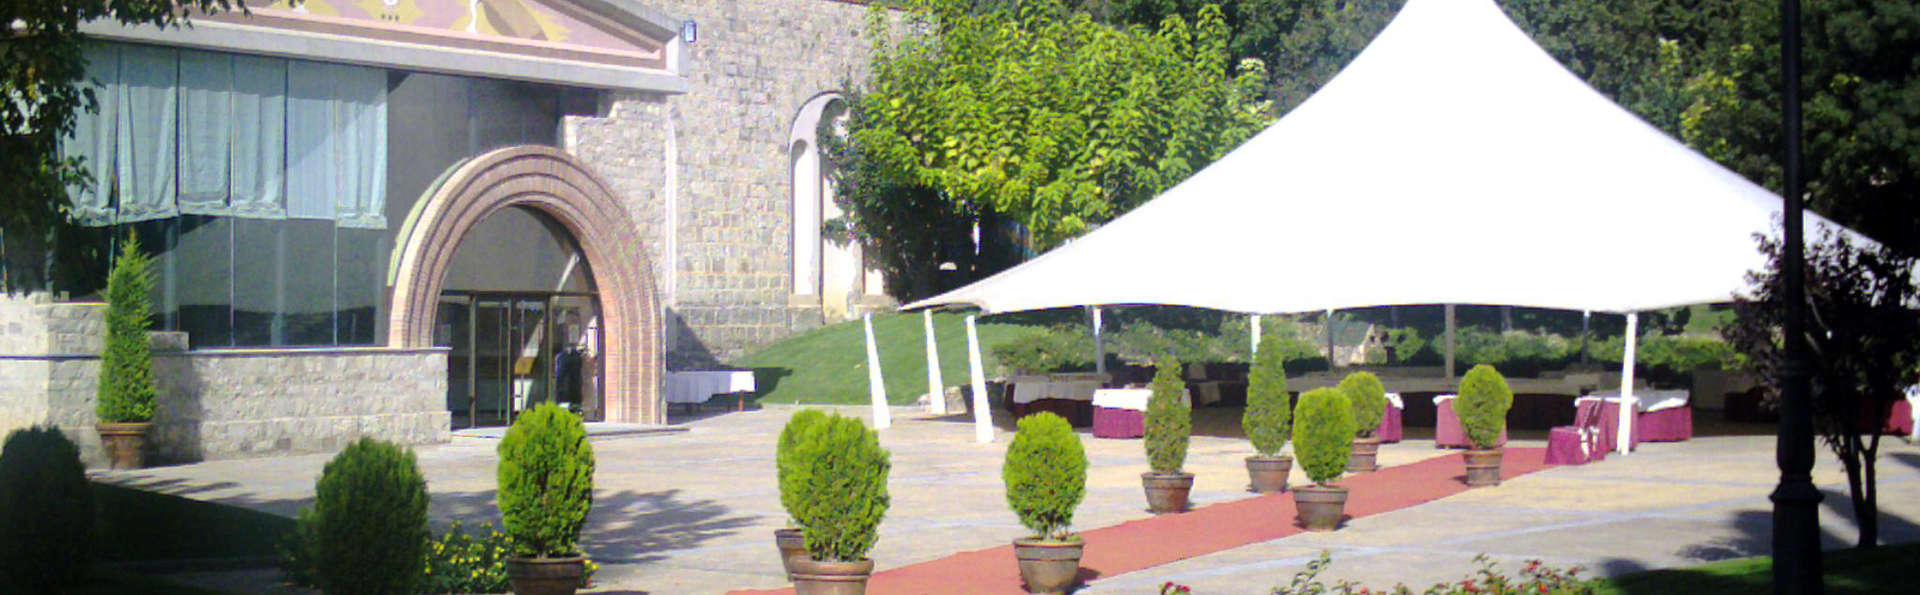 Hotel Balneari de Vallfogona de Riucorb - Edit_Garden3.jpg